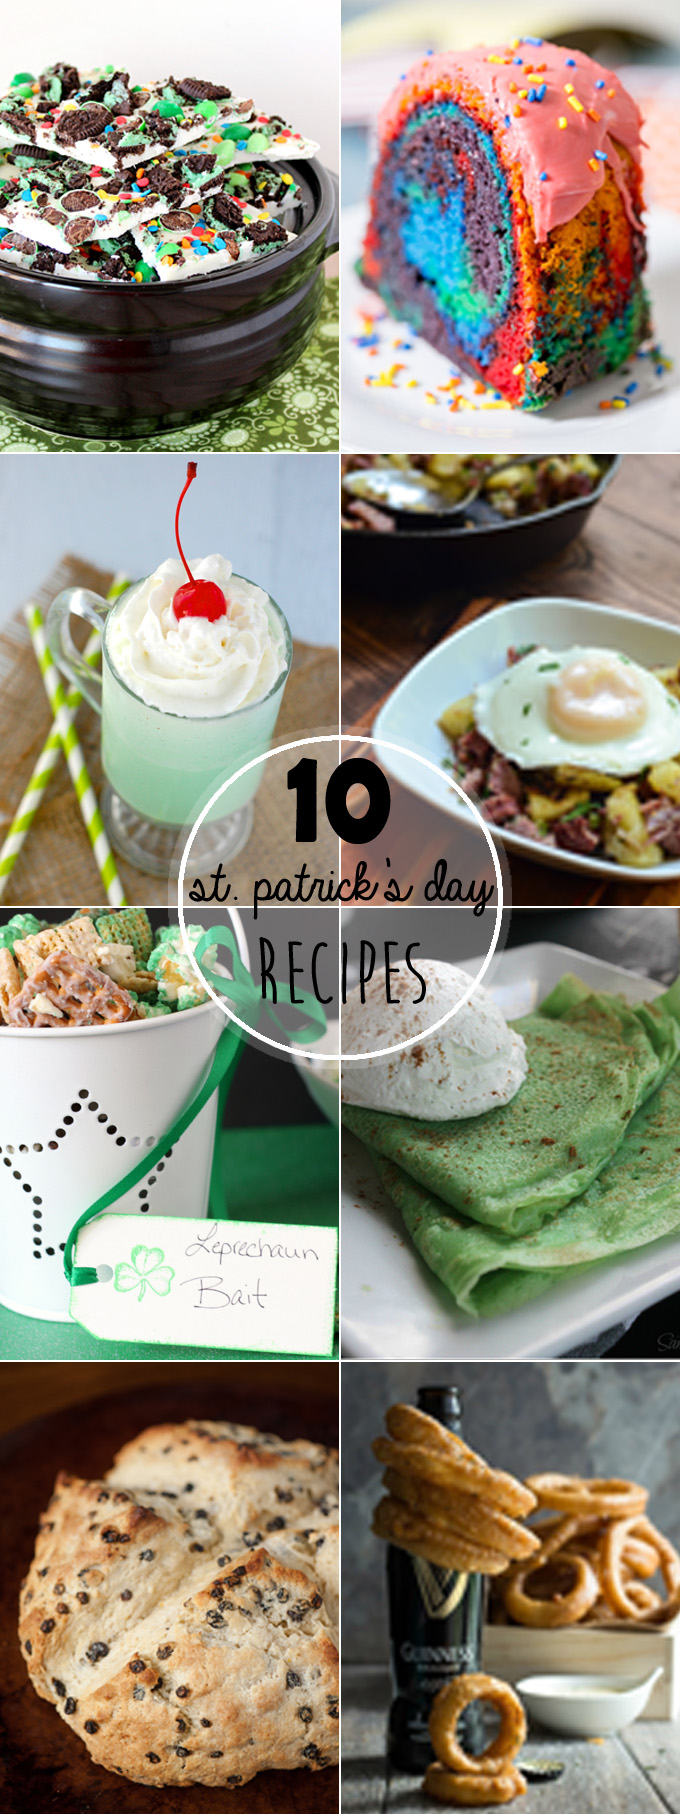 st-patricks-day-recipes-pinterest